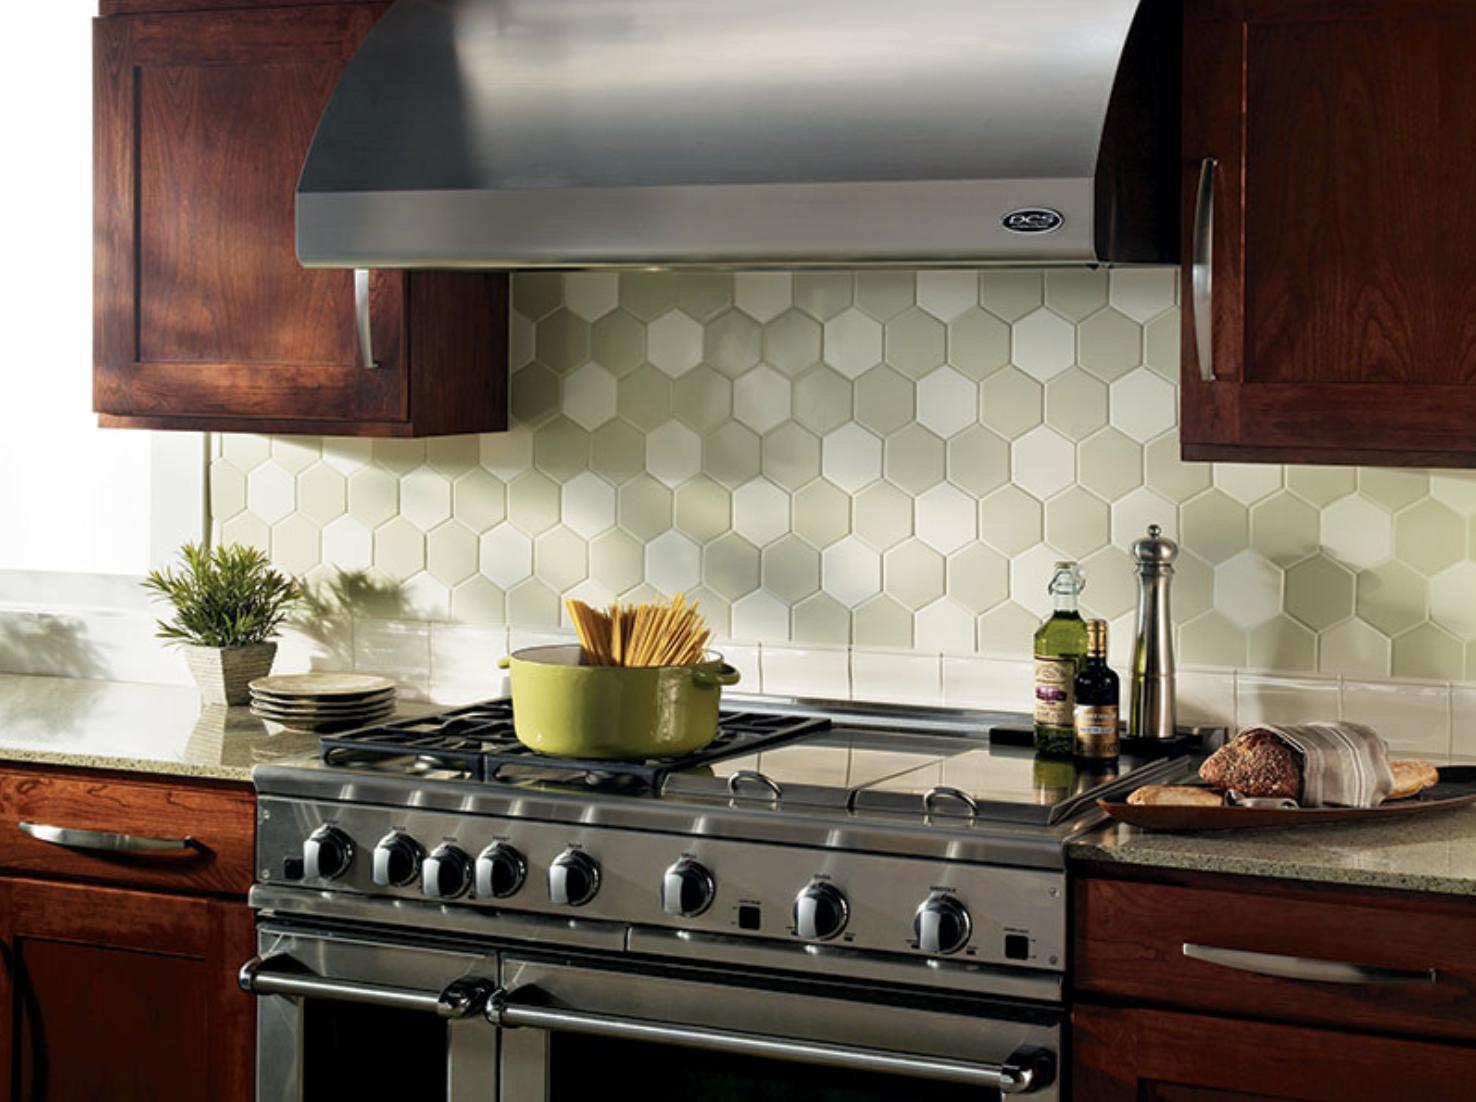 Backsplash Patterns for the Kitchen